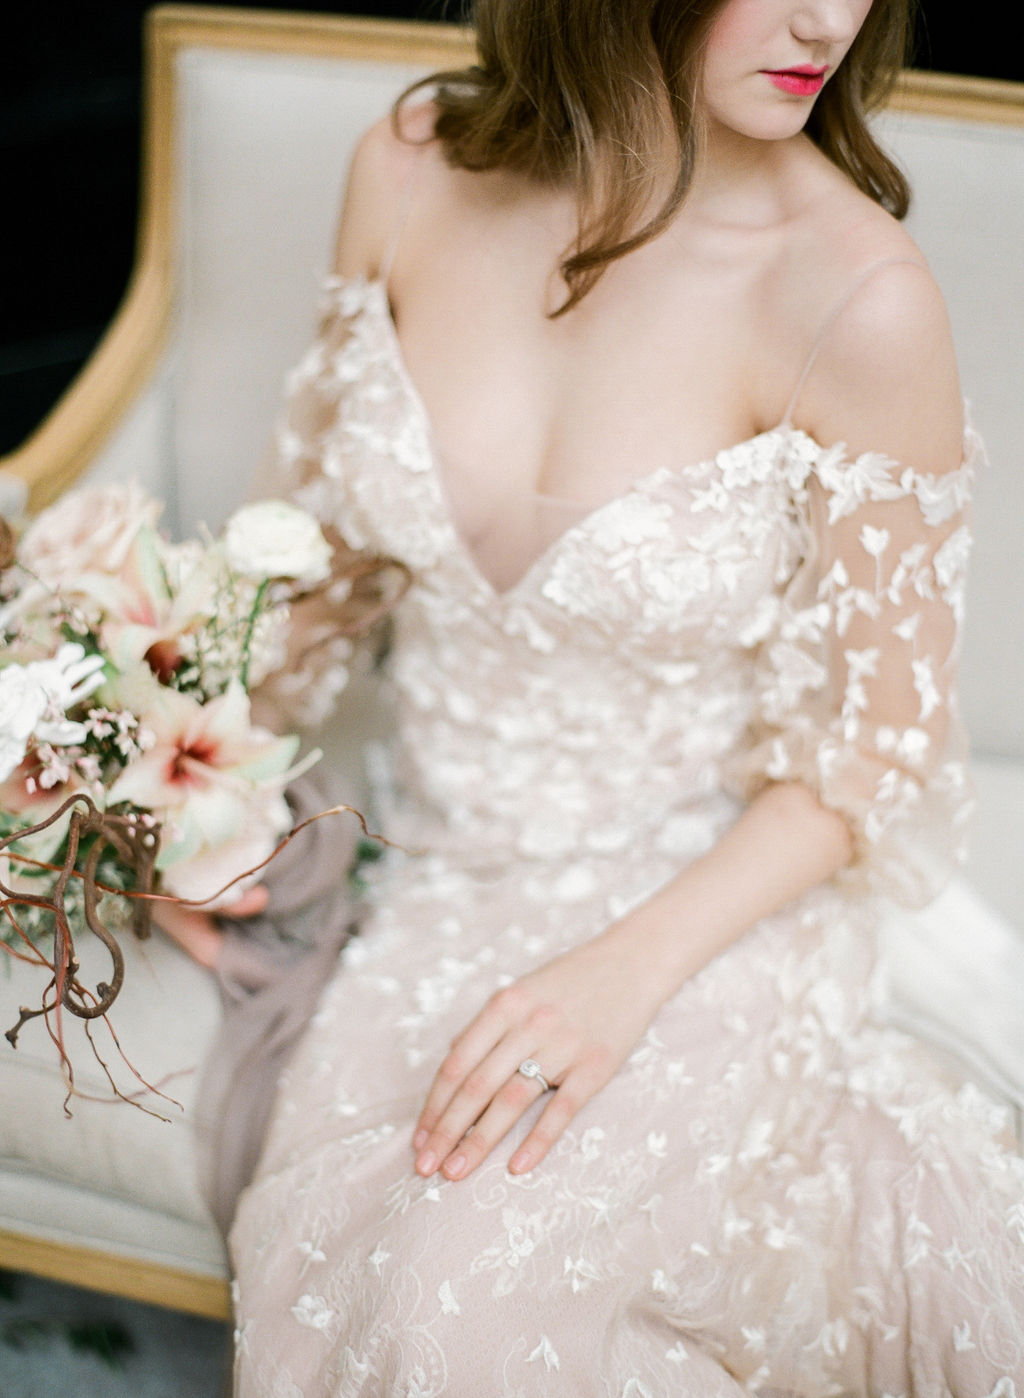 artiese-ago-wedding-editorial-000423680015.jpg